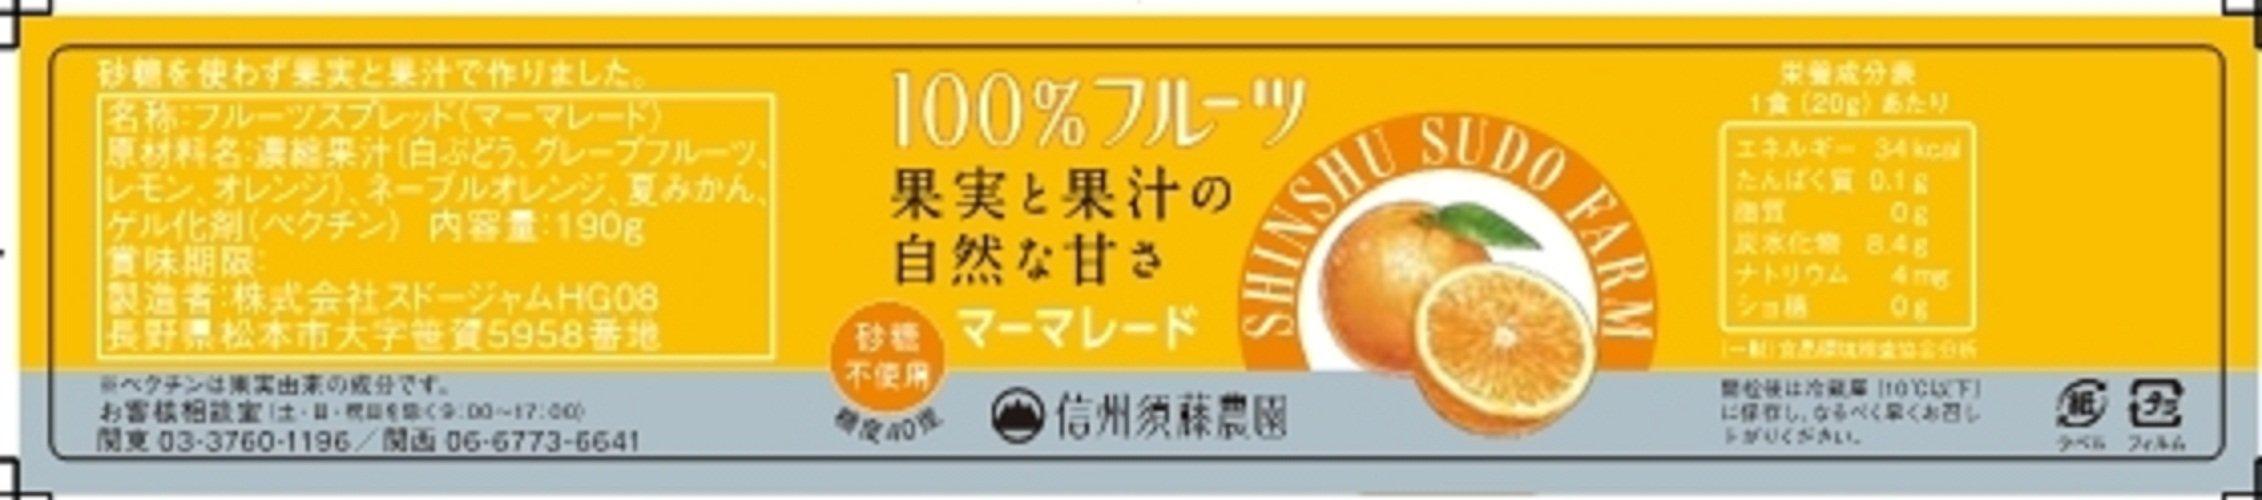 Sudojamu 190gX6 or 100 percent fruit marmalade